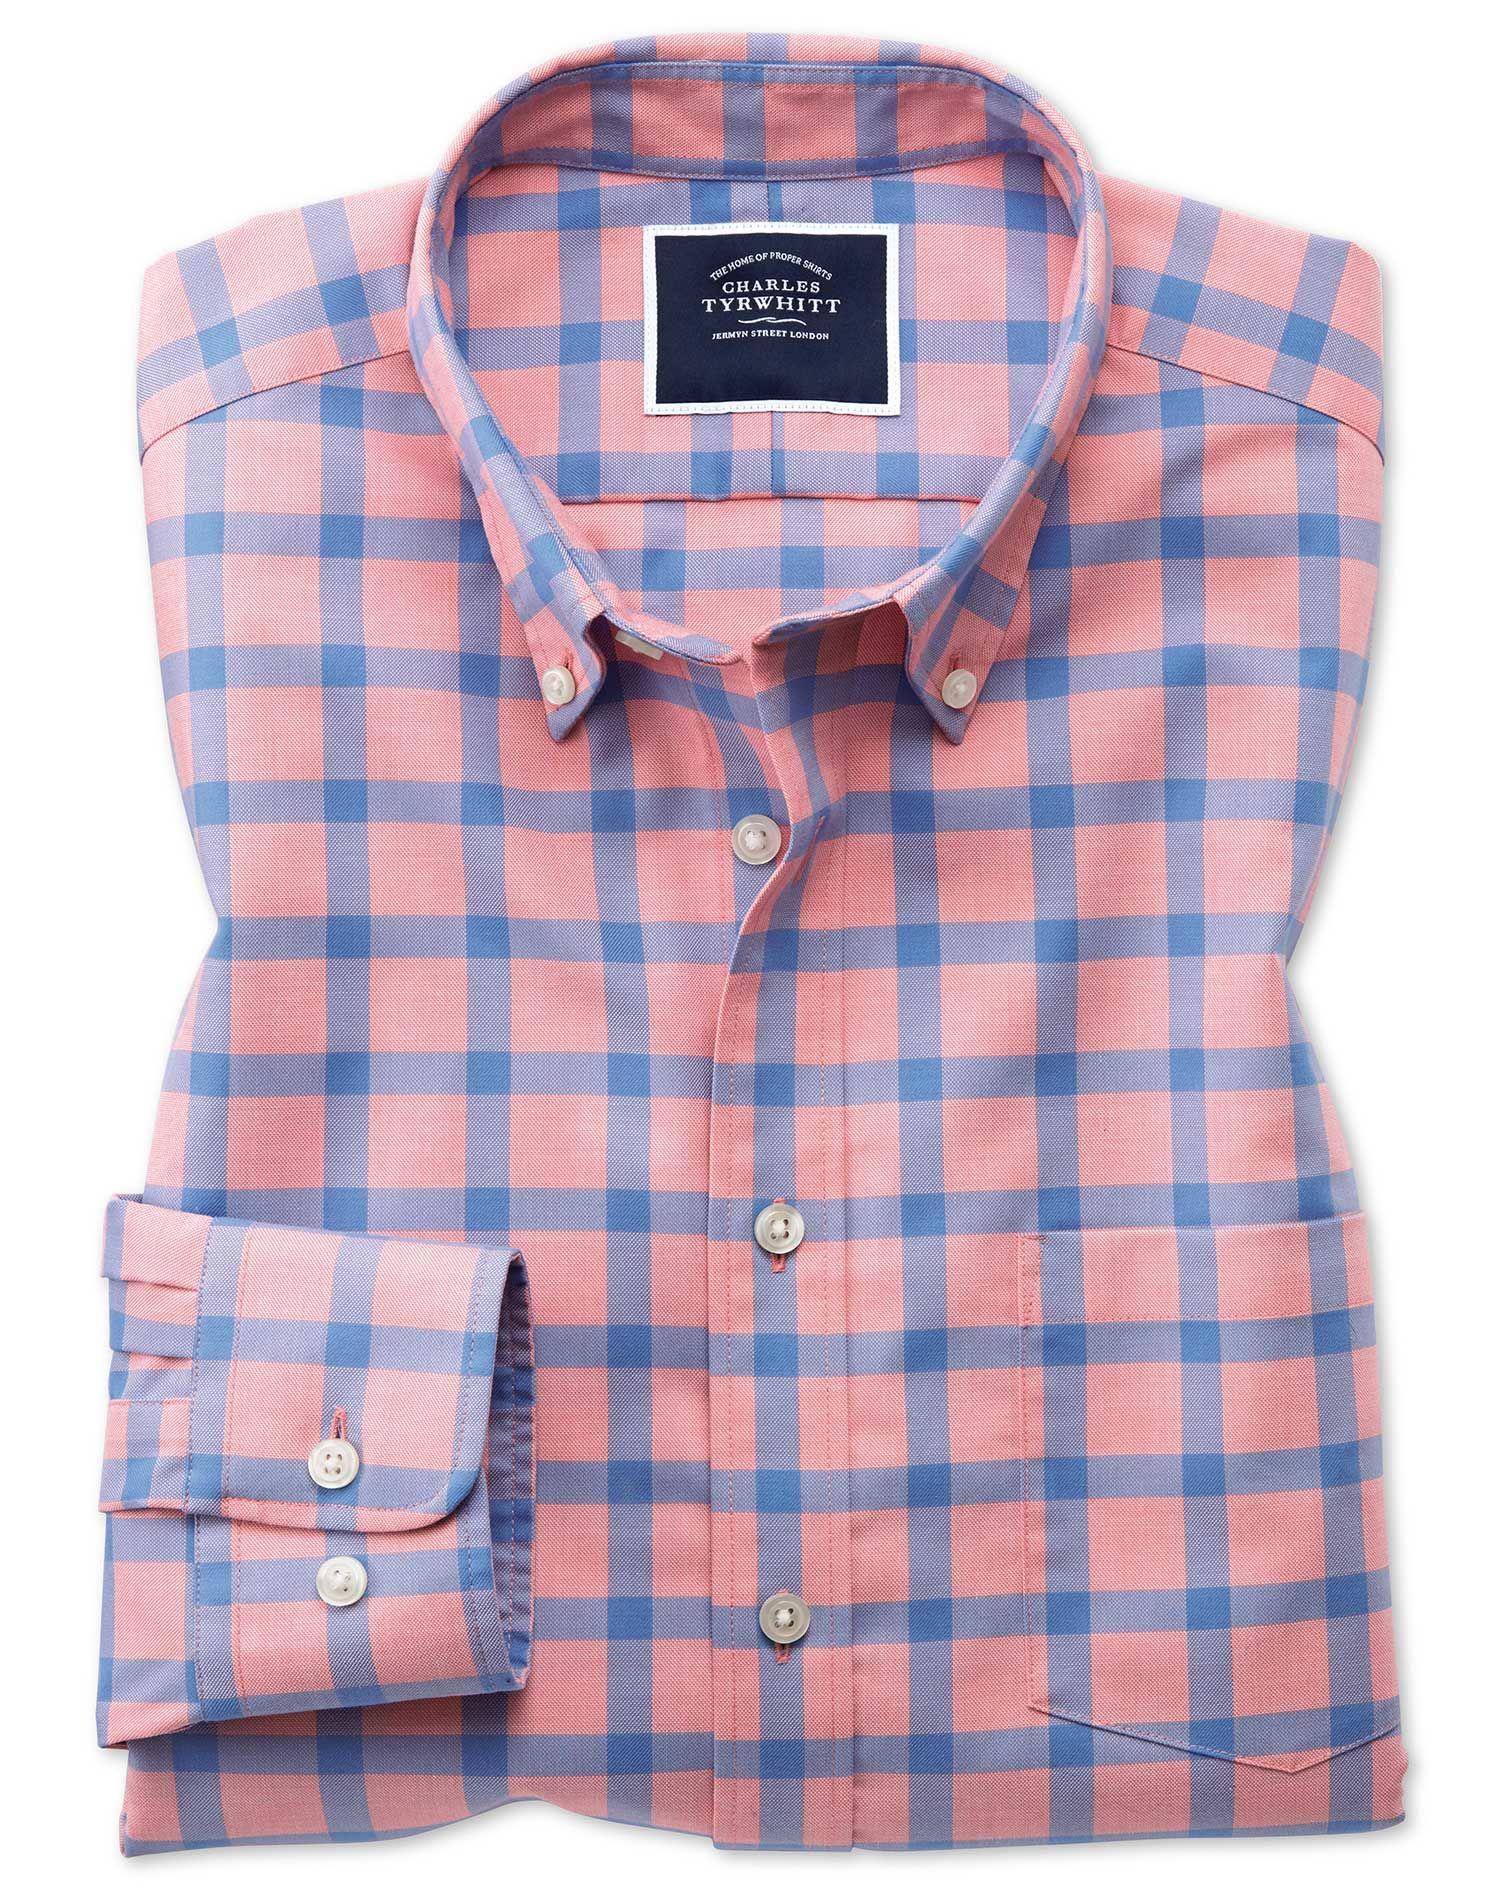 Men's Casual Shirts   Charles Tyrwhitt